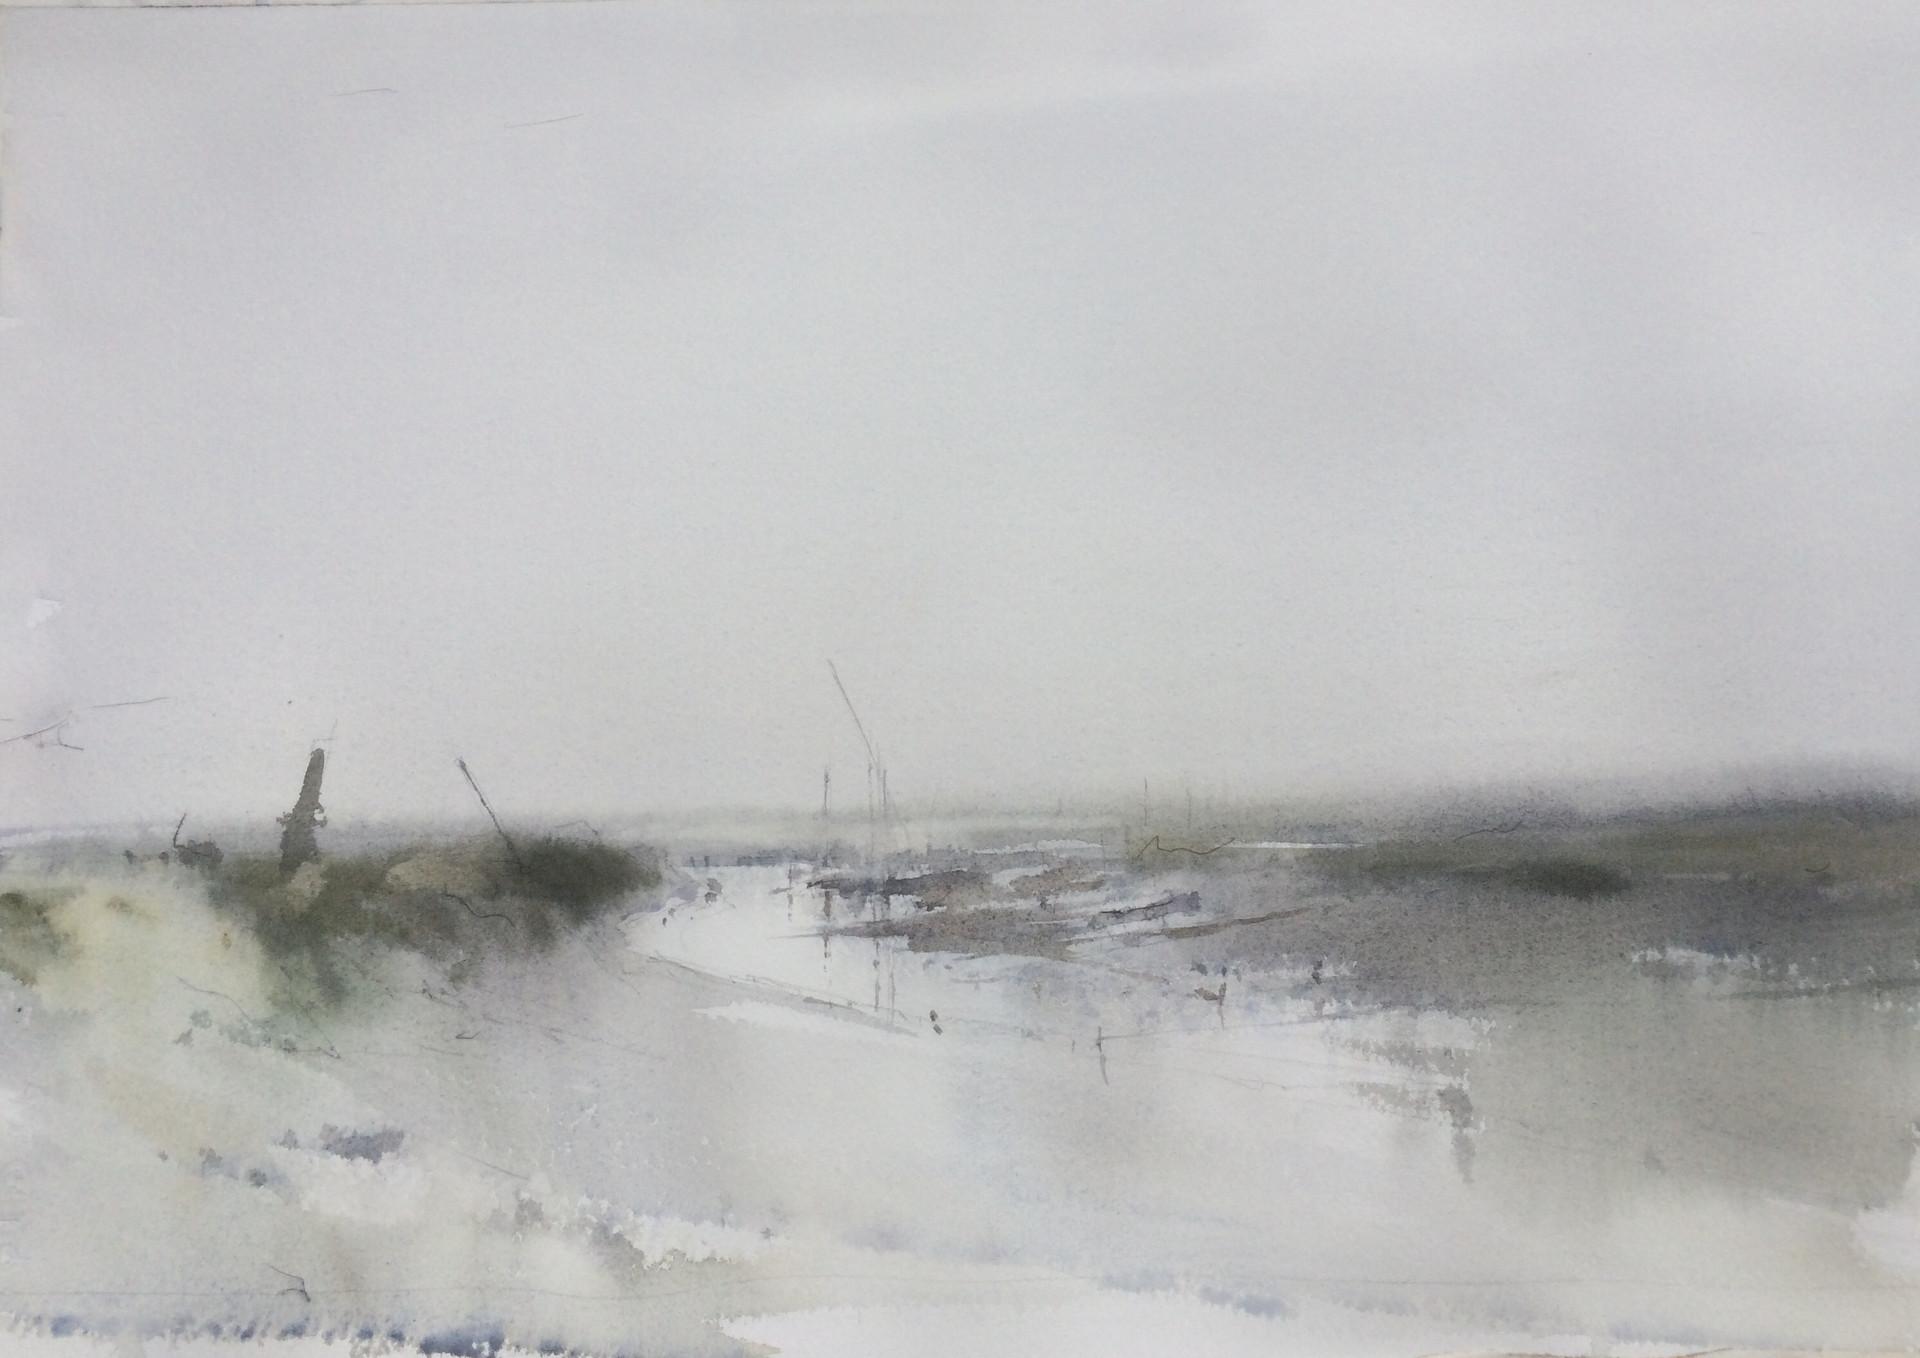 Morston quay in the mist